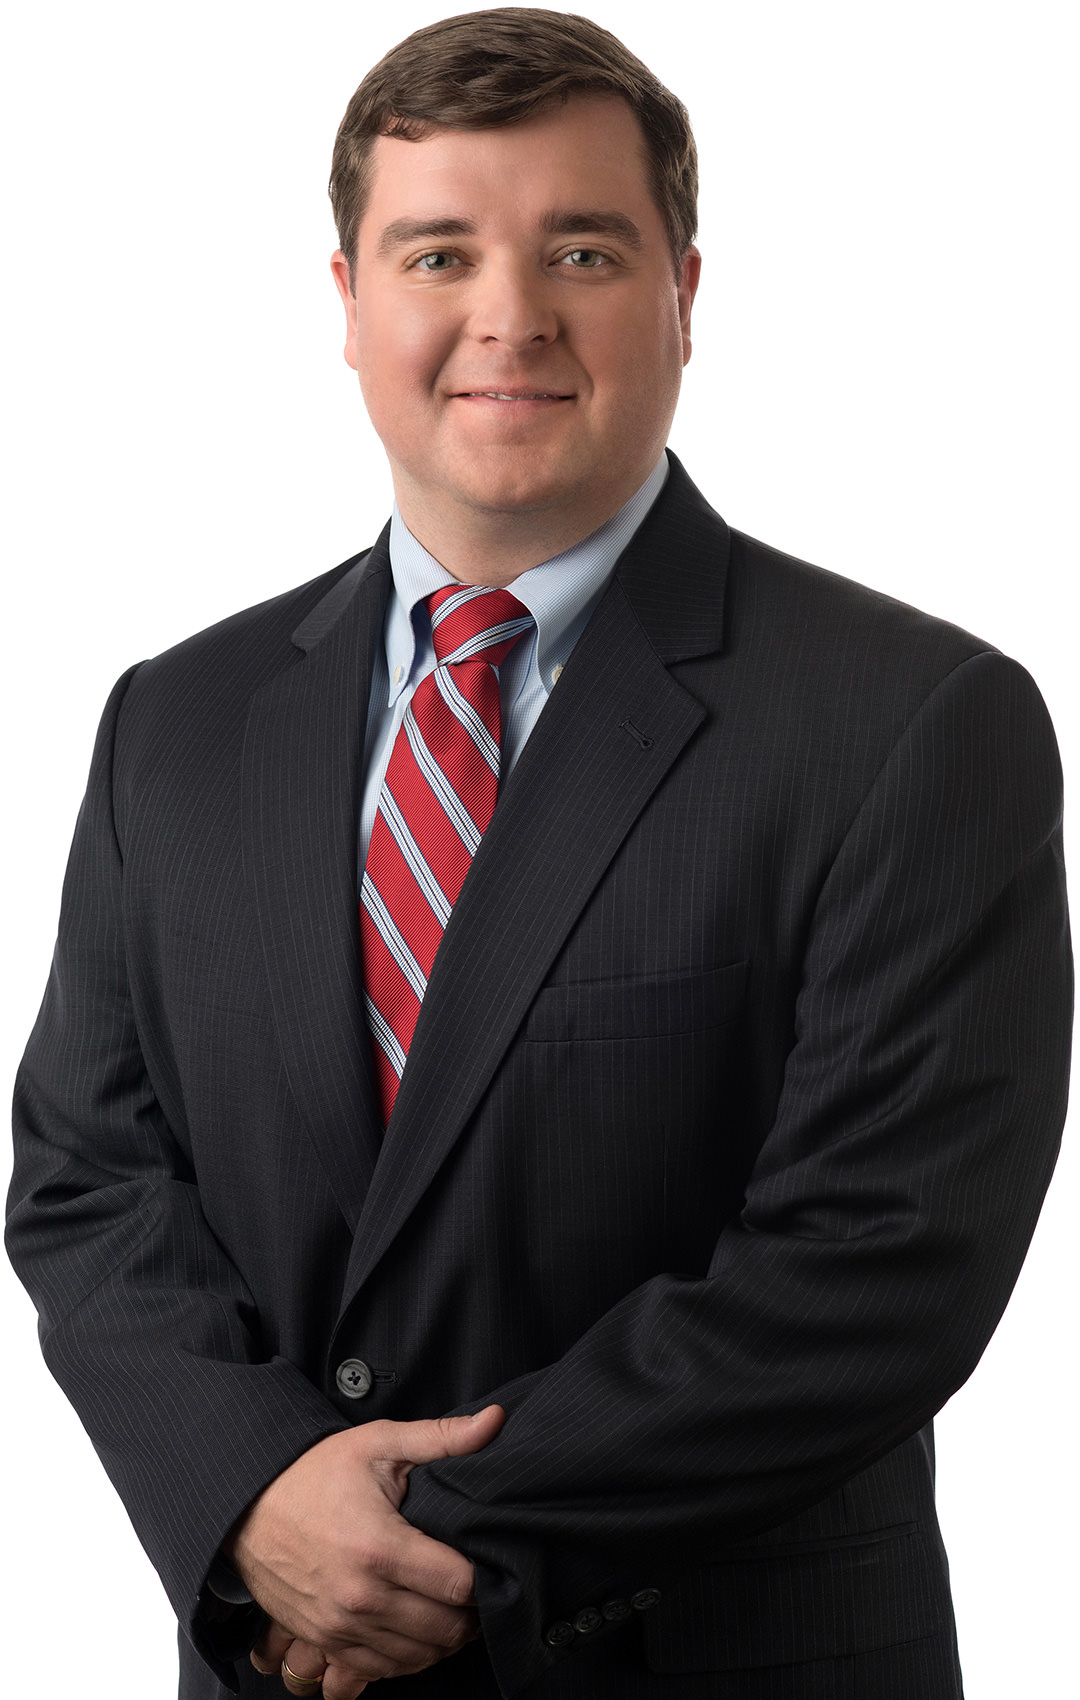 James B. Glenn